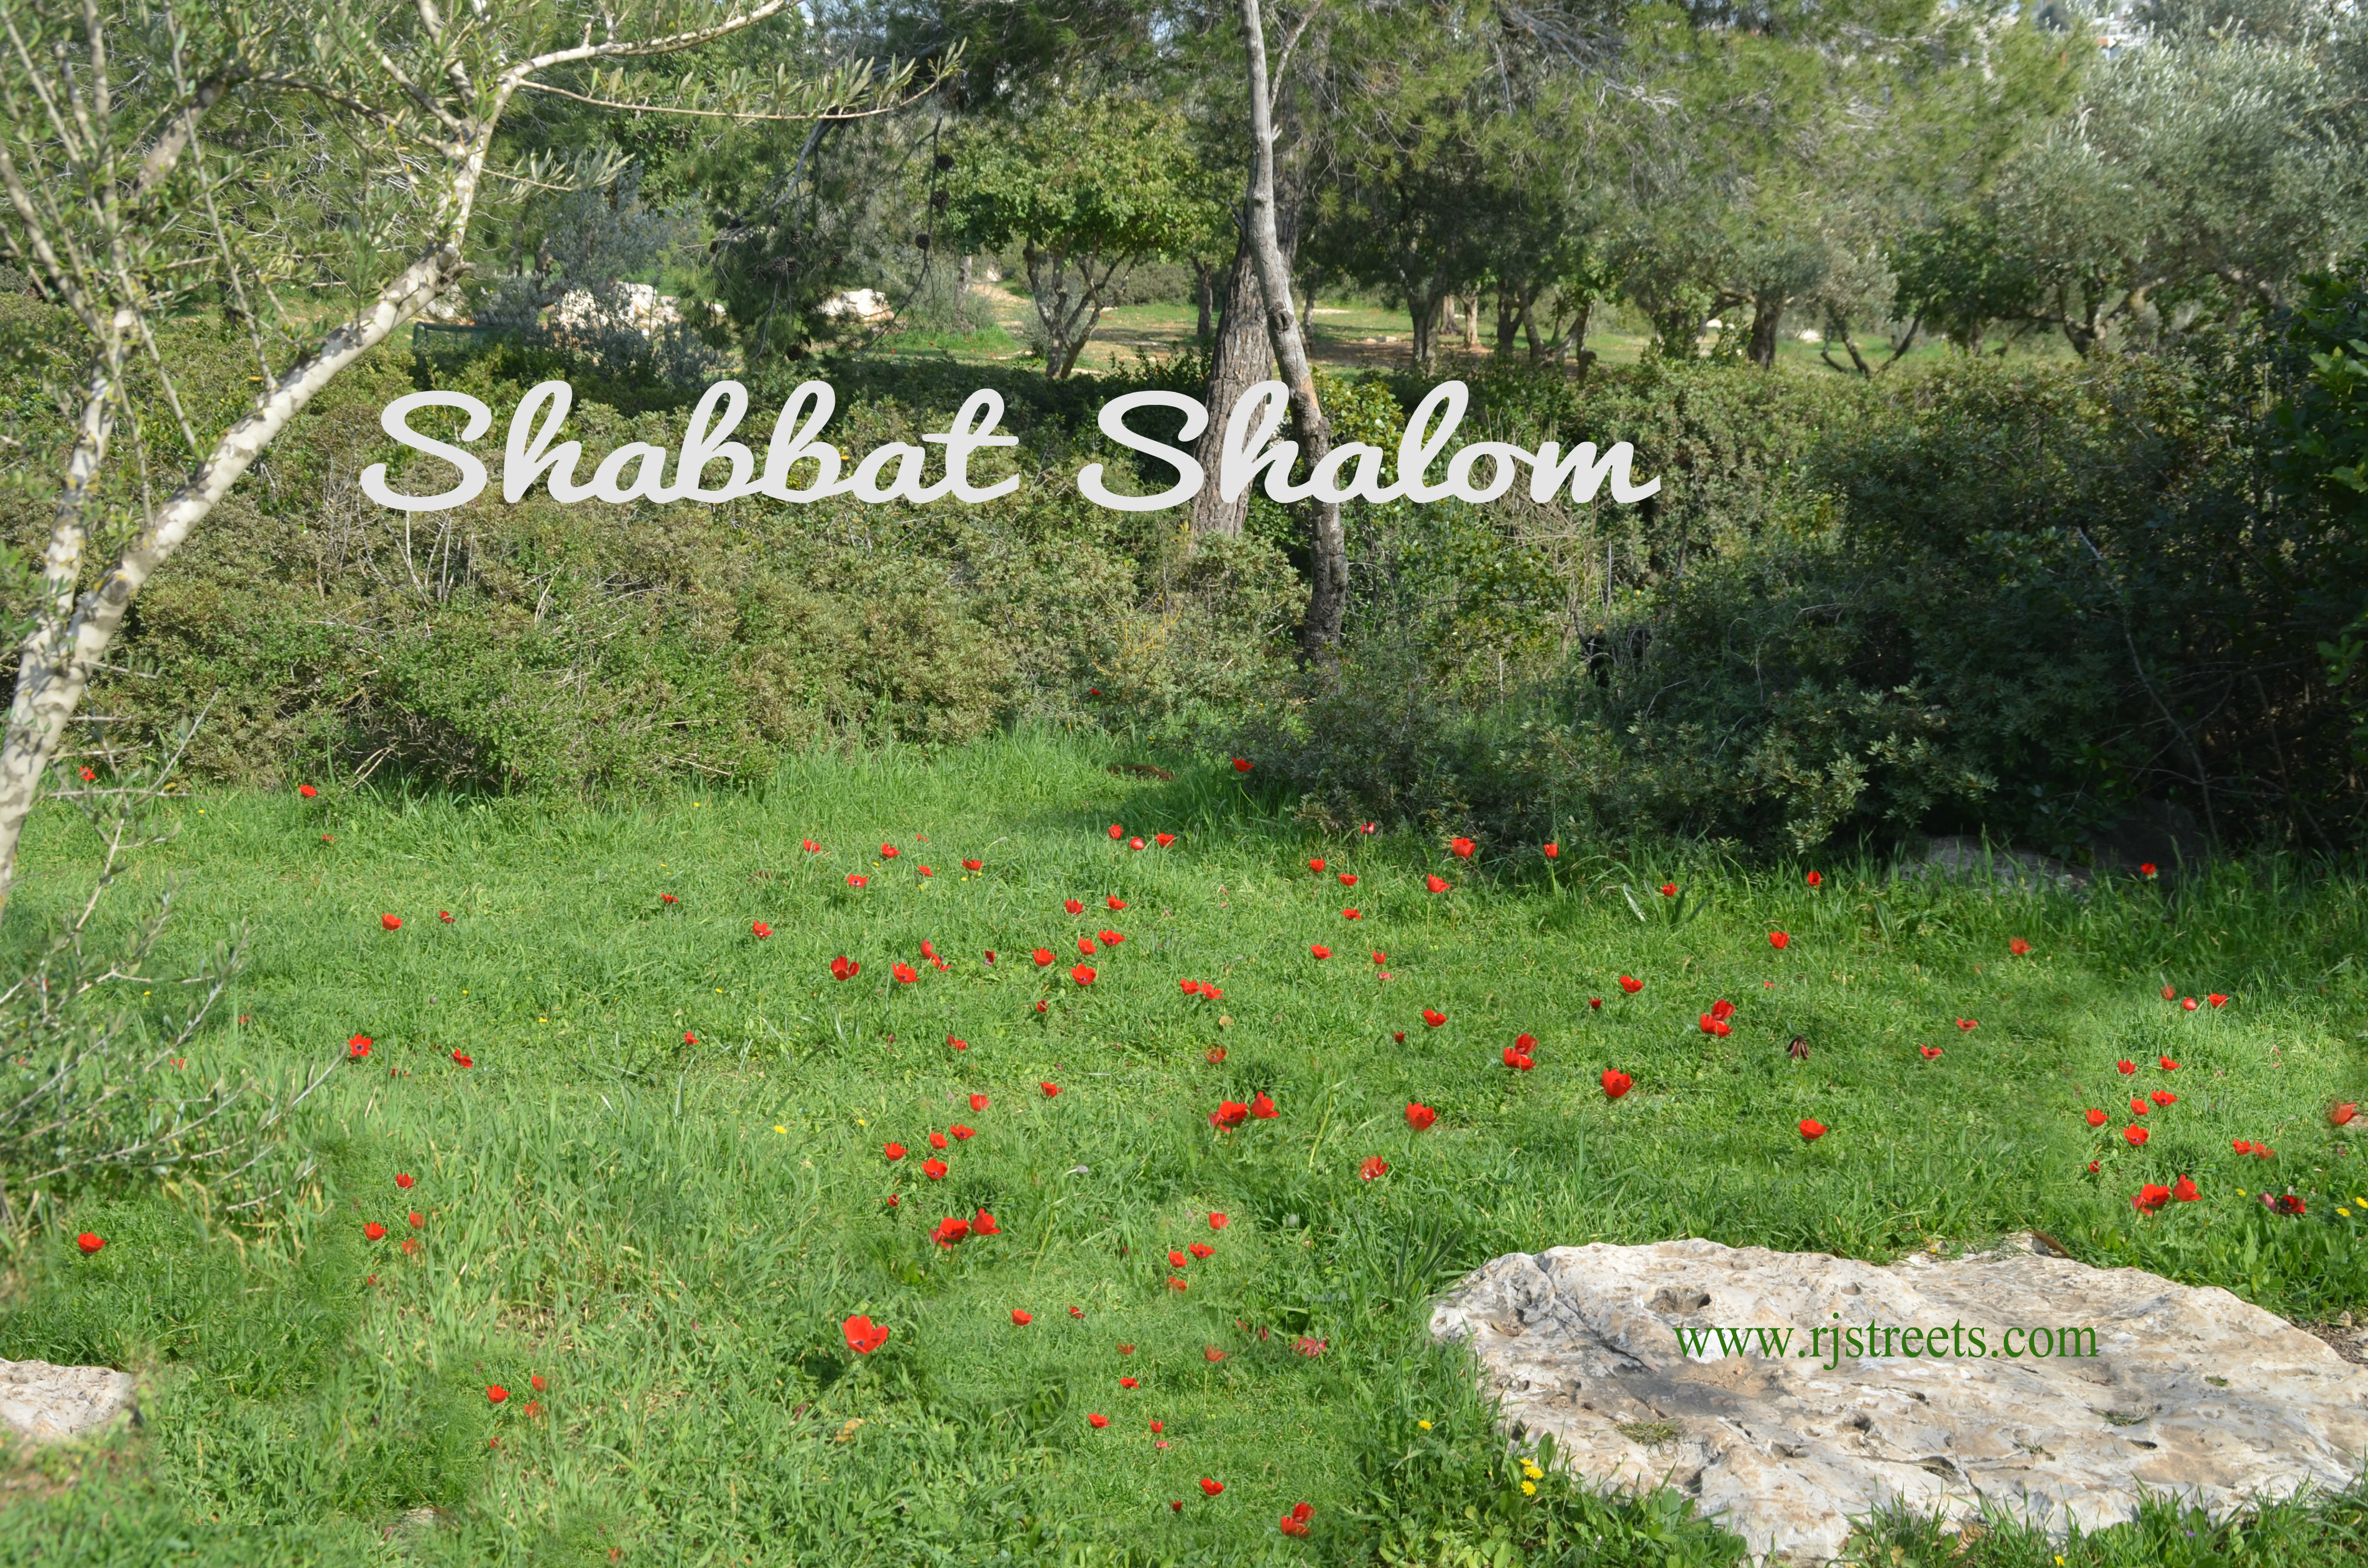 image Shabbos